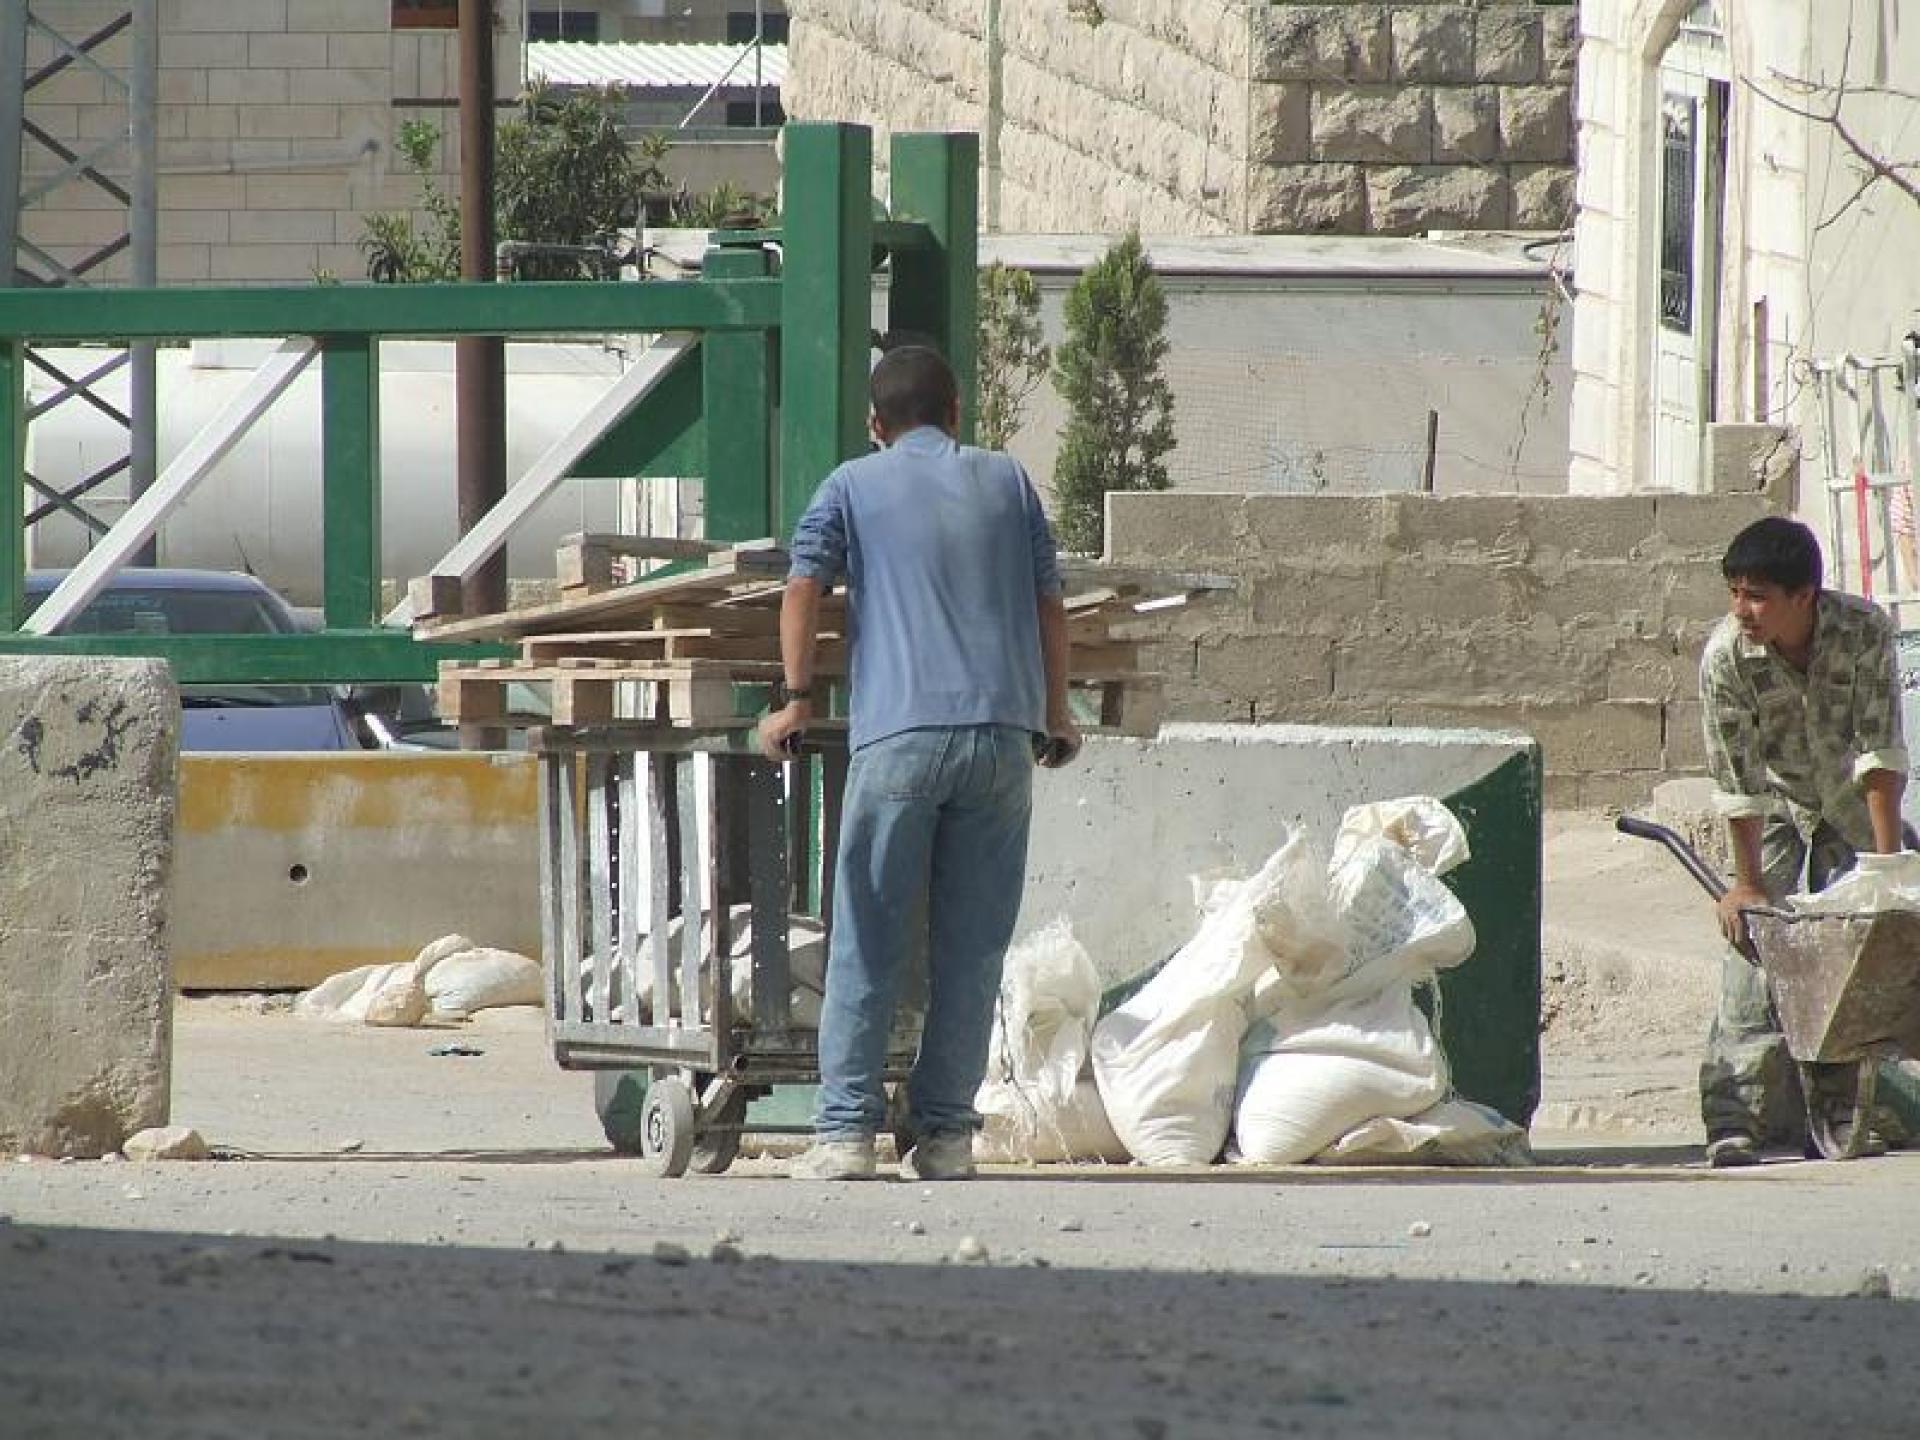 Hebron 10.06.09